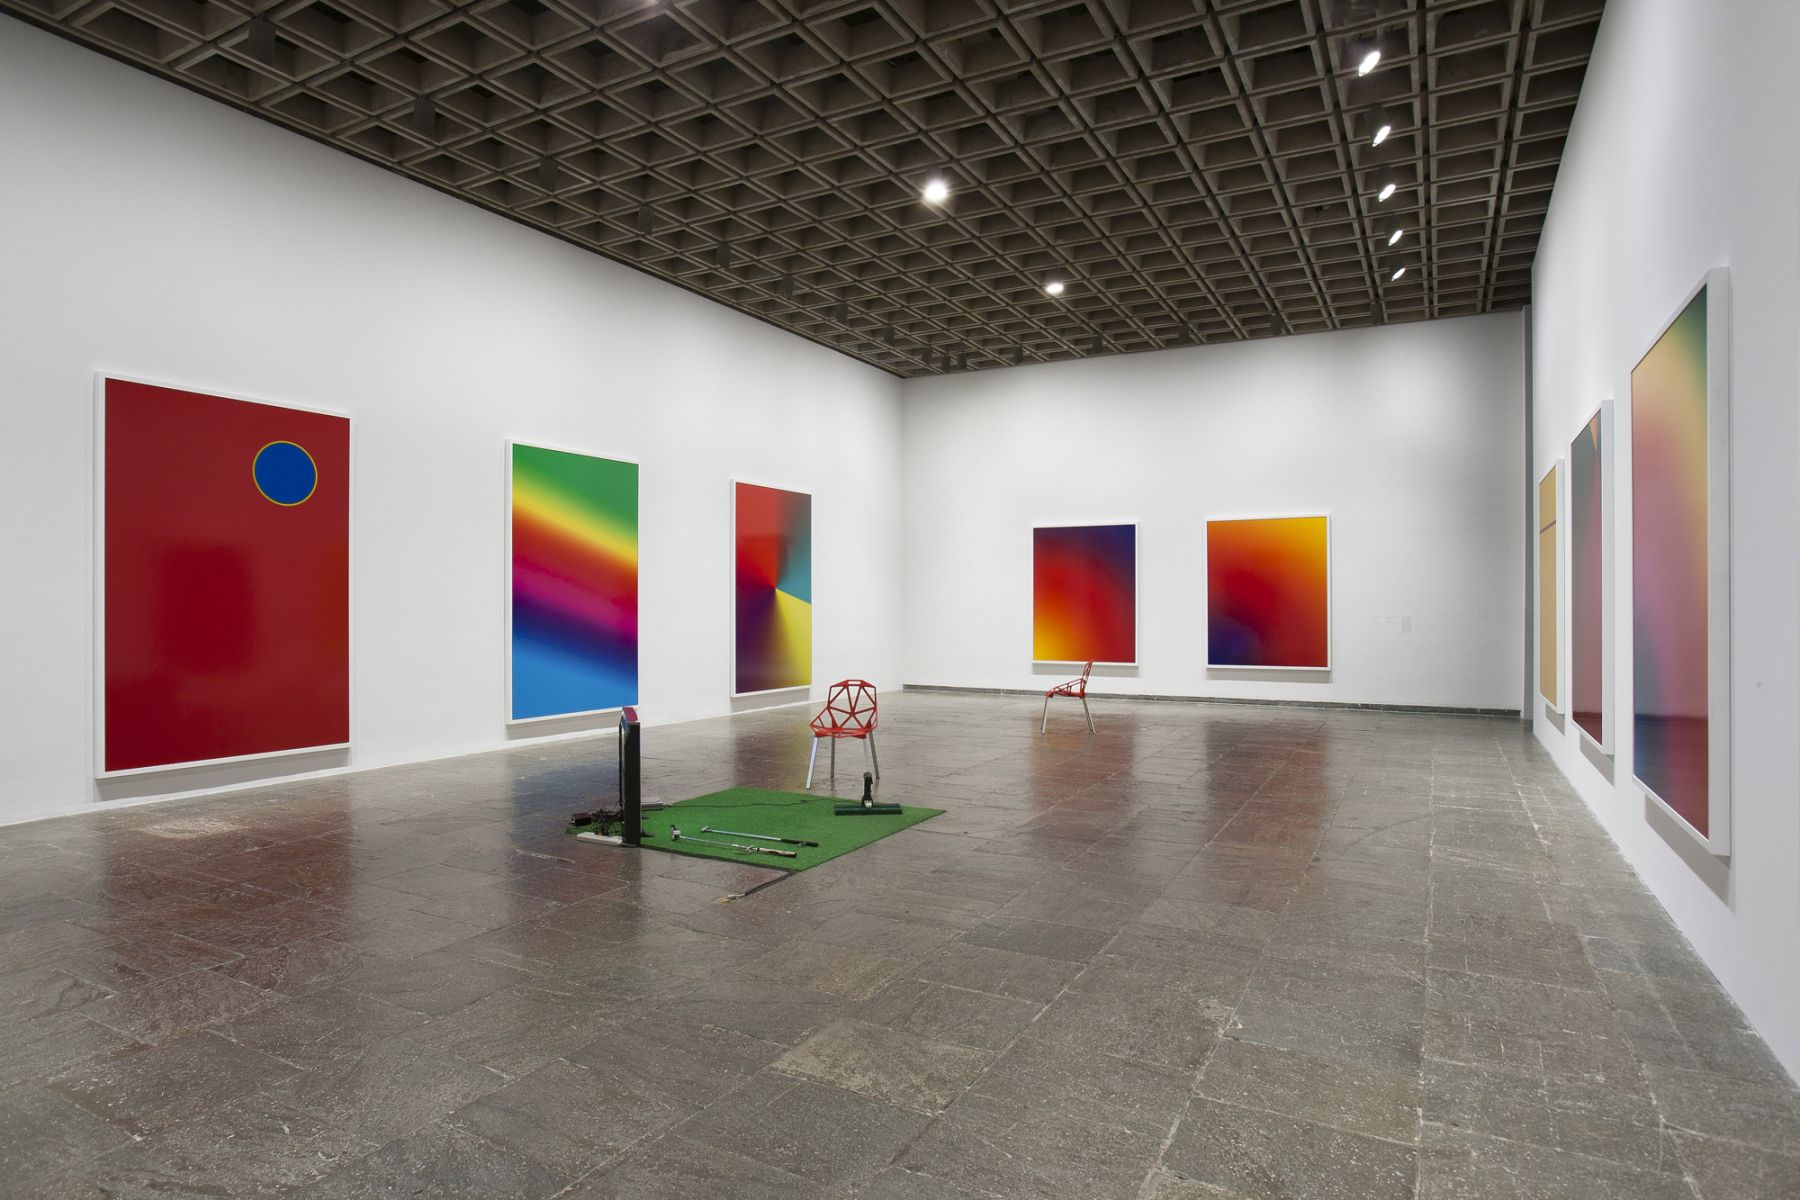 Cory Arcangel, Installation view,Pro Tools, Whitney Museum of American Art, New York, 2011